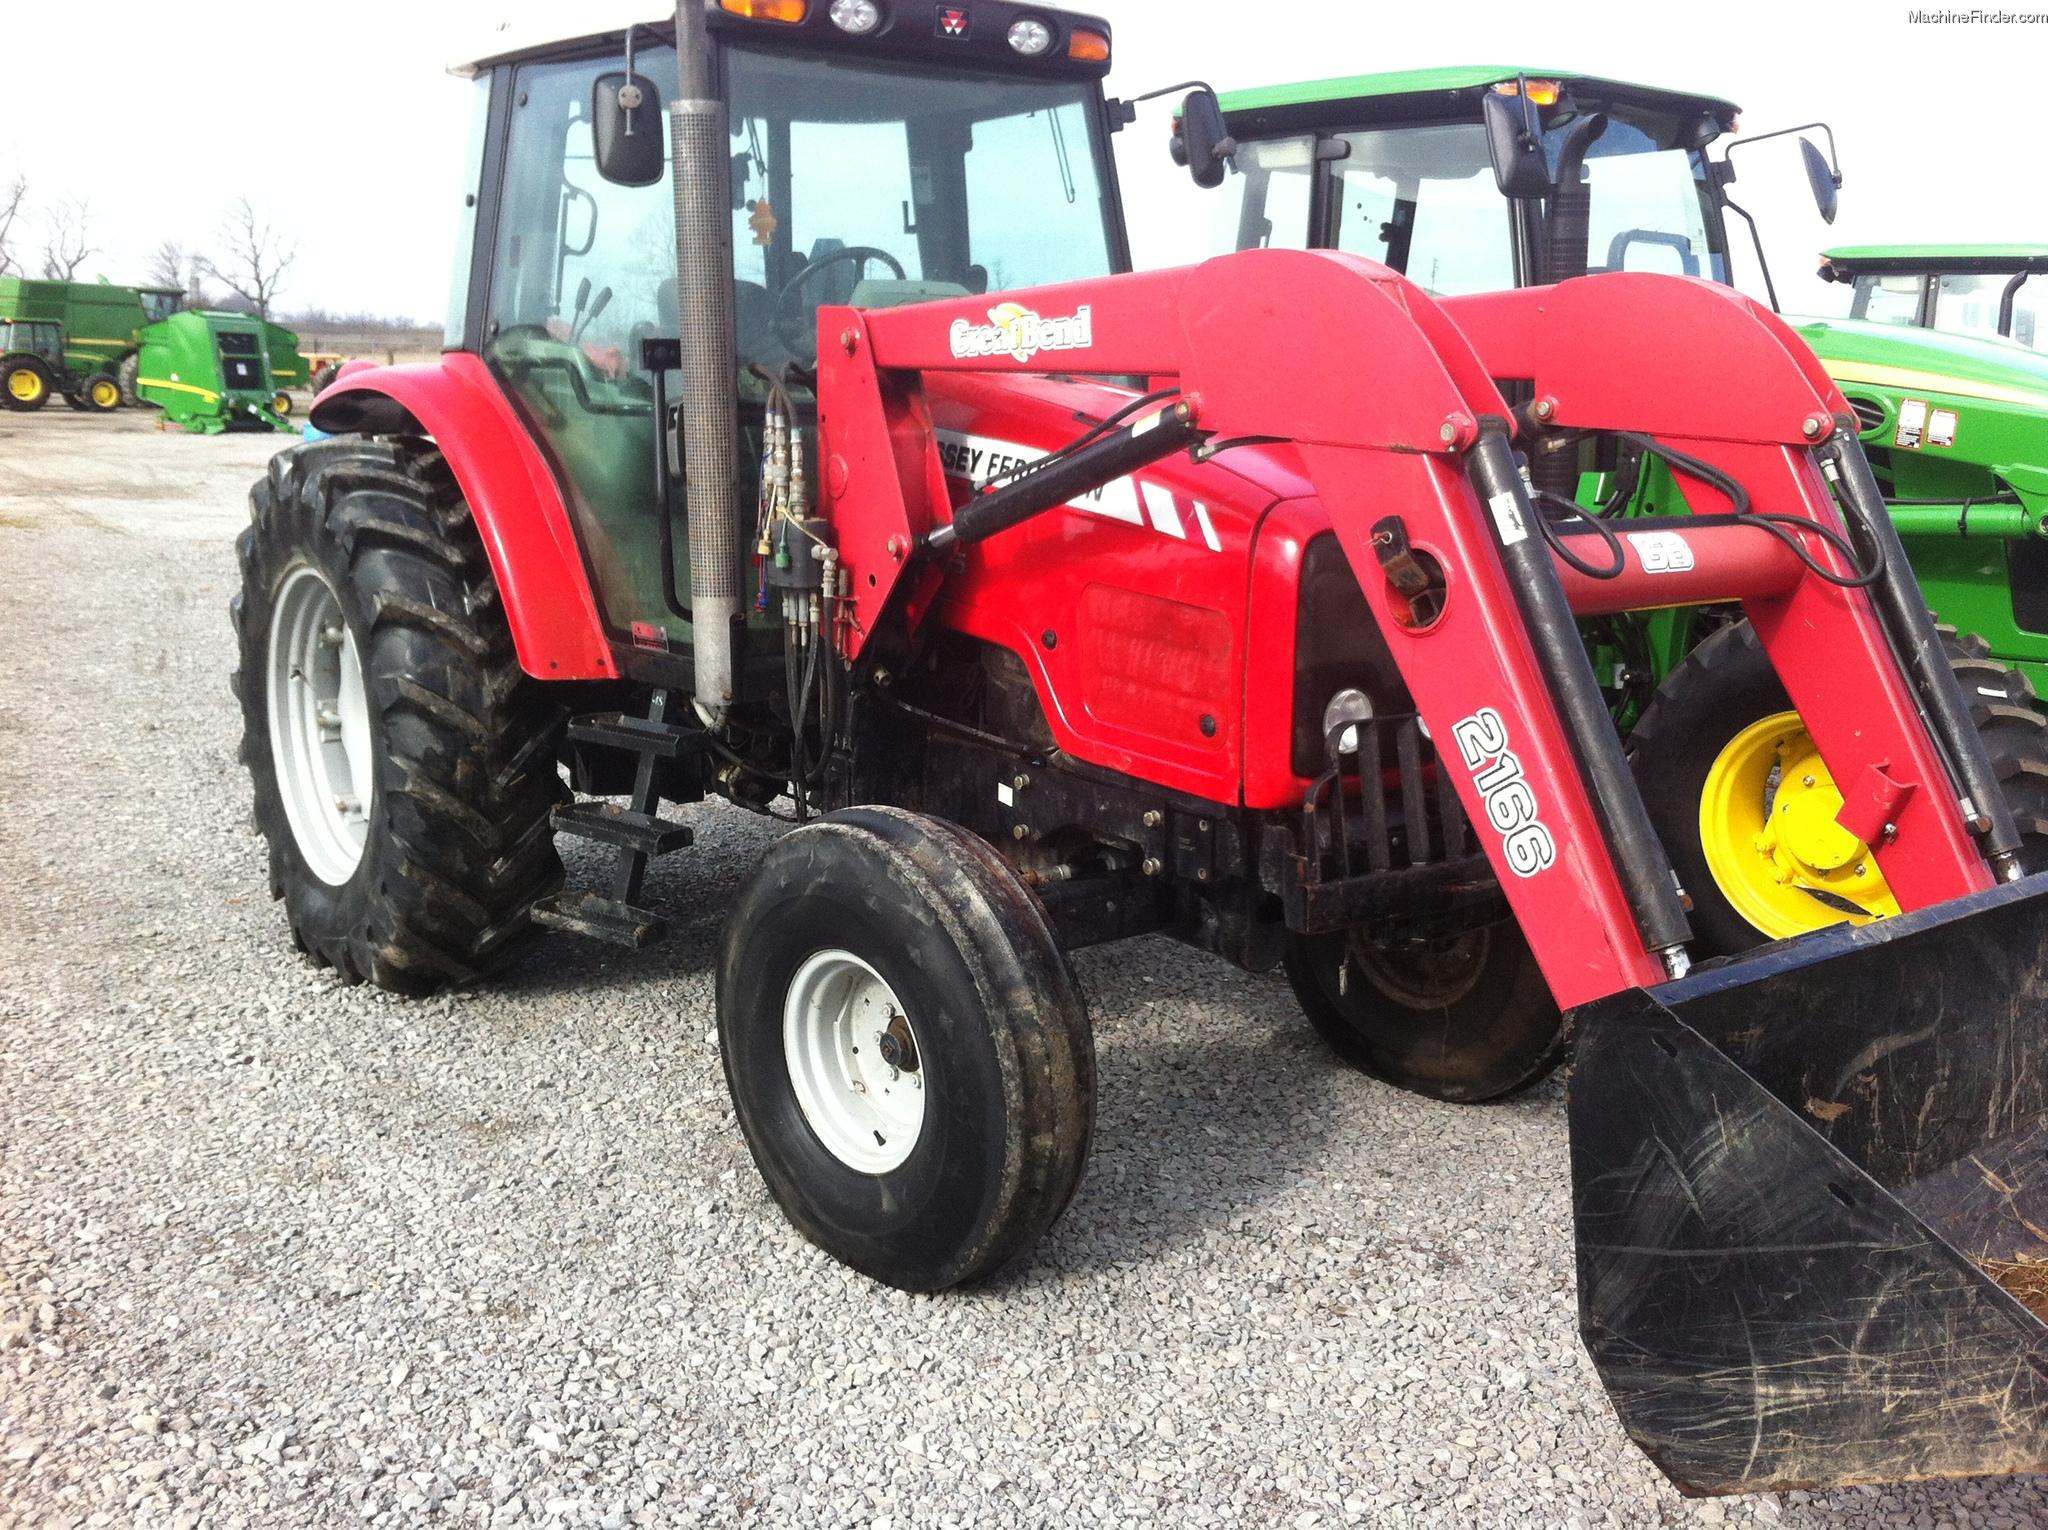 2005 Massey - Ferguson 5455 Tractors - Utility (40-100hp) - John Deere MachineFinder